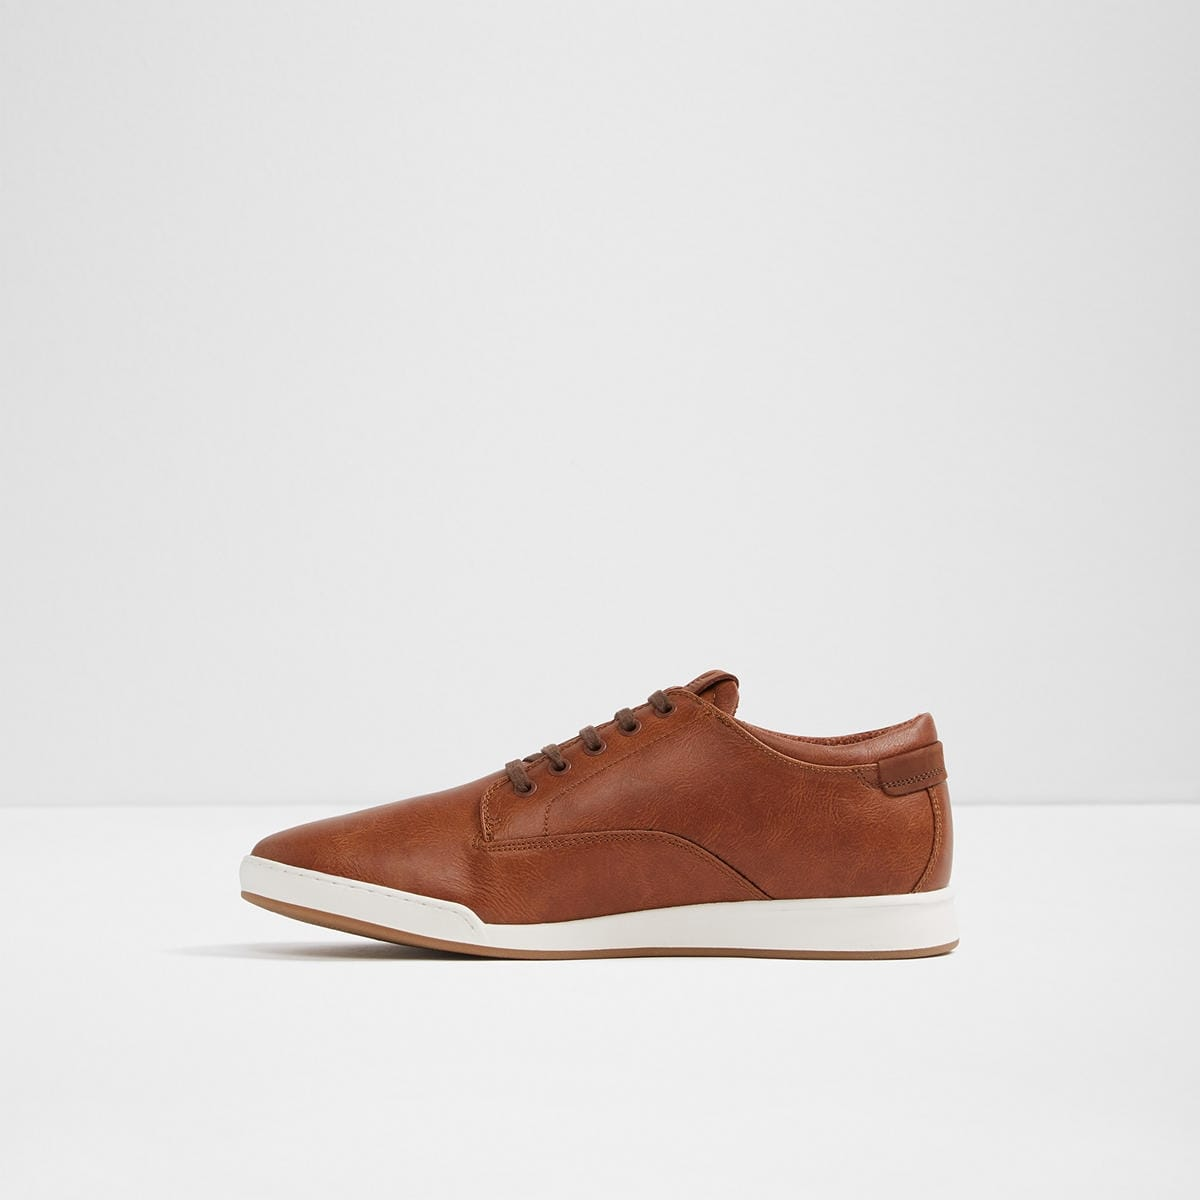 69f7c8168df605 Shop Aldo Mens nerrawia Low Top Lace Up Fashion Sneakers